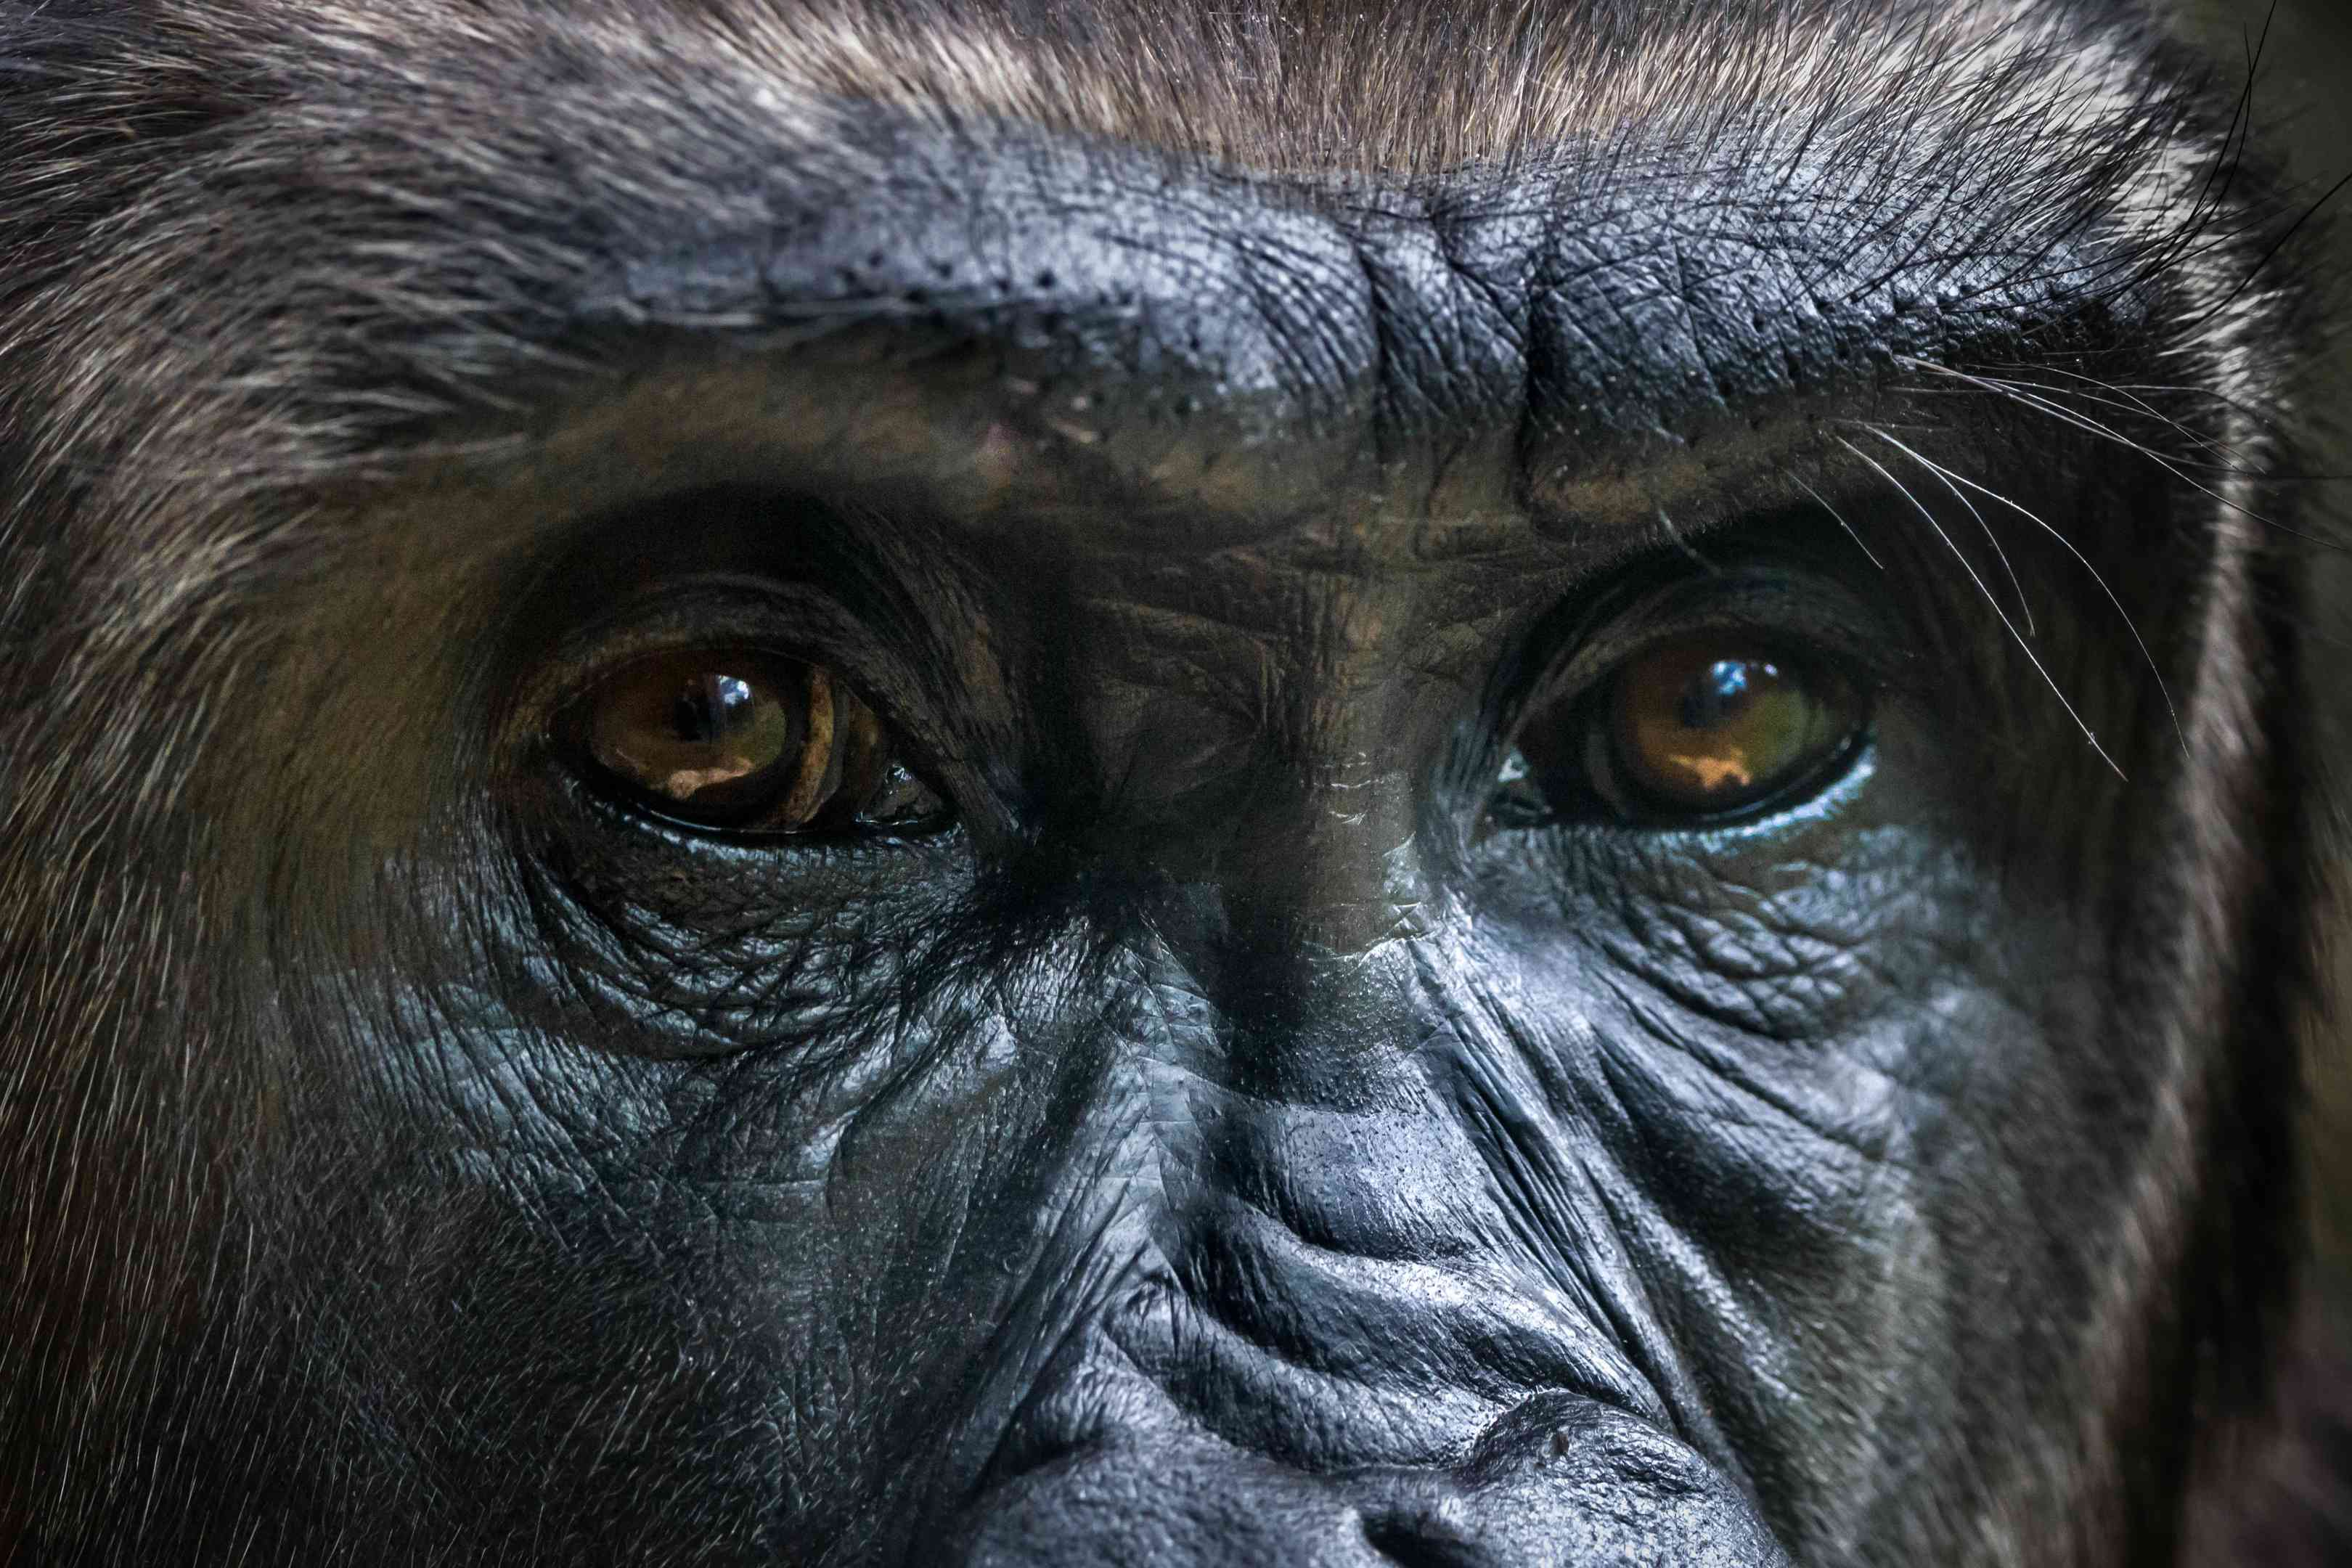 A close up of Gorilla eyes.